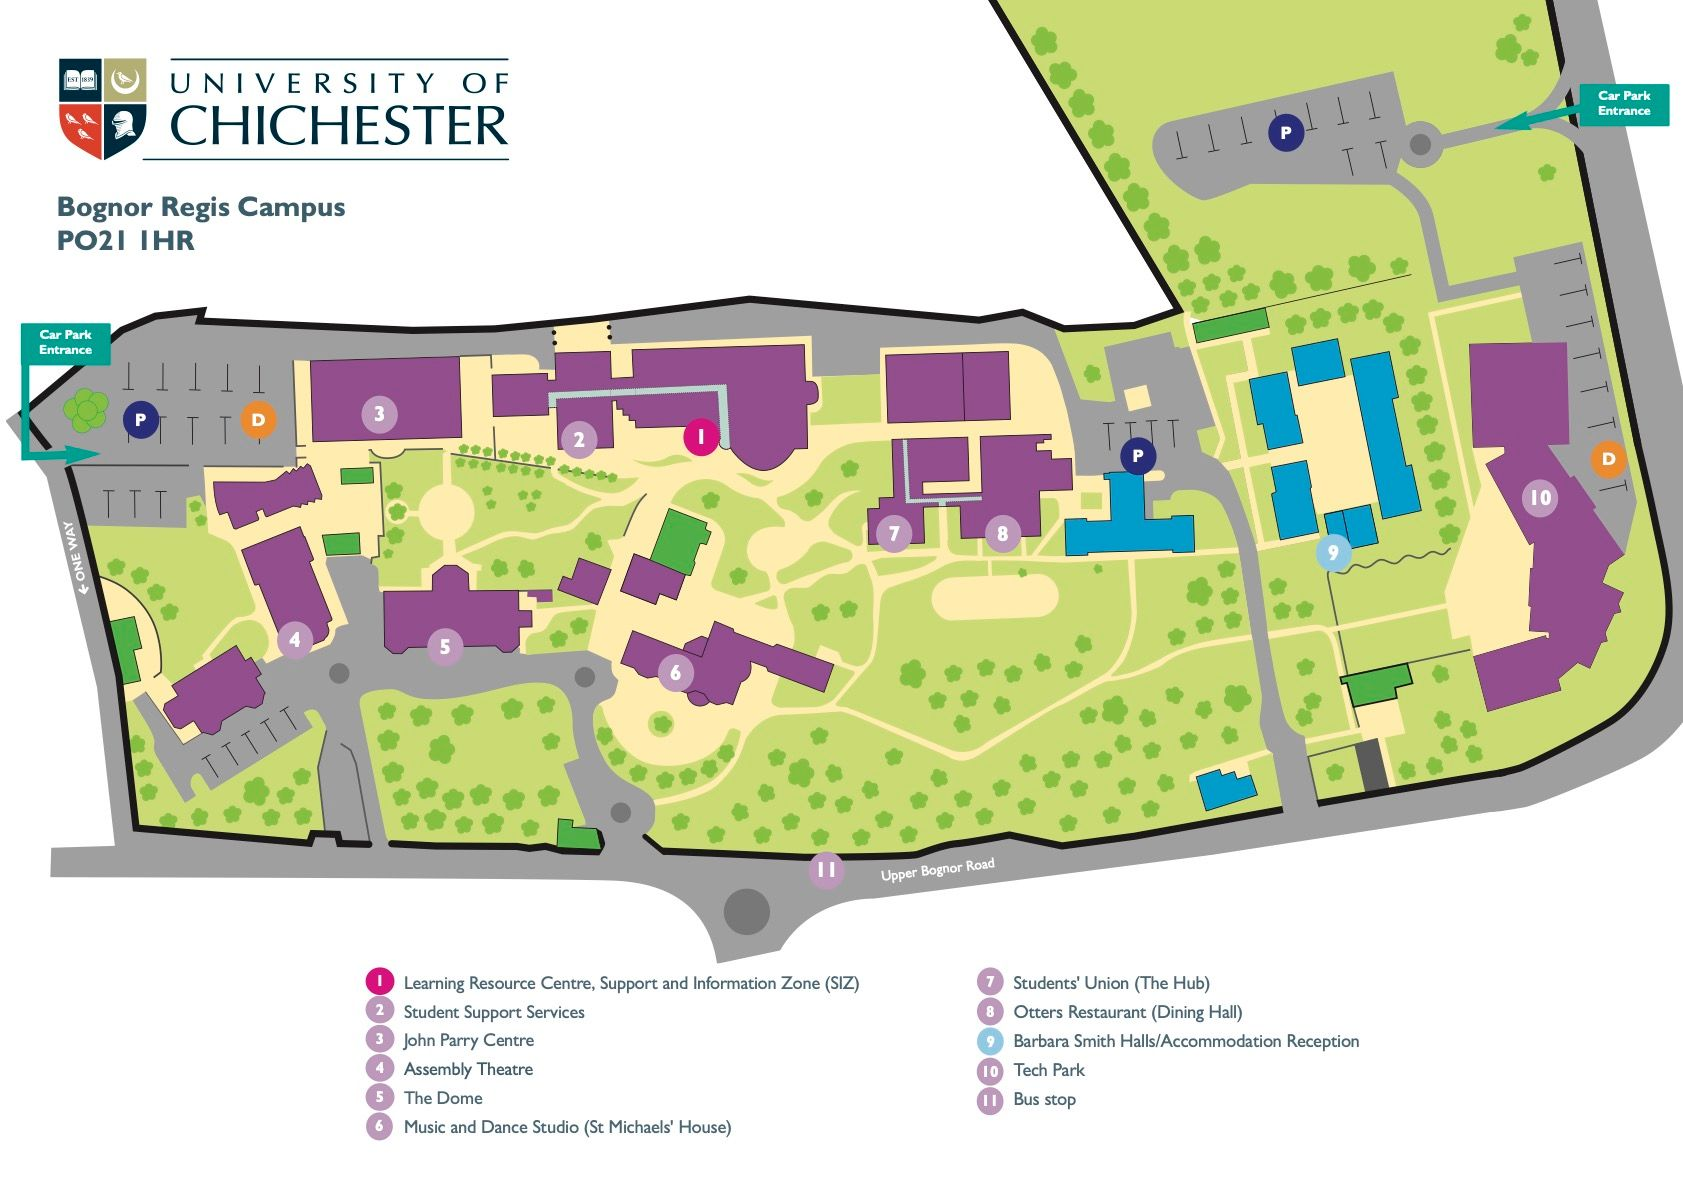 university of chichester bognor regis